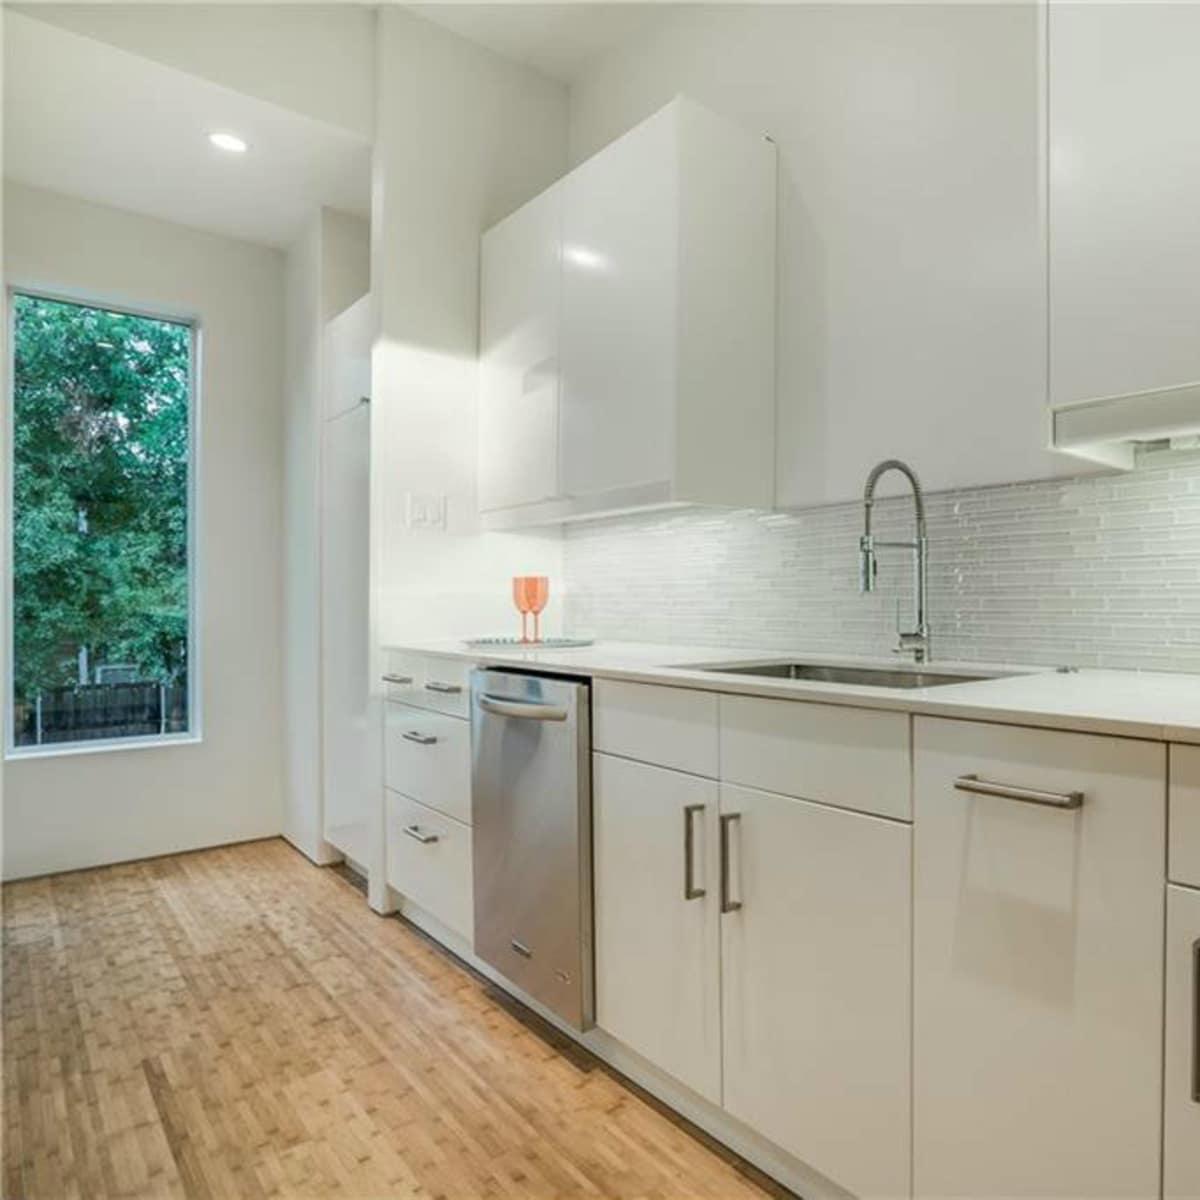 Kitchen 4401 Roseland Ave. Unit B in Dallas